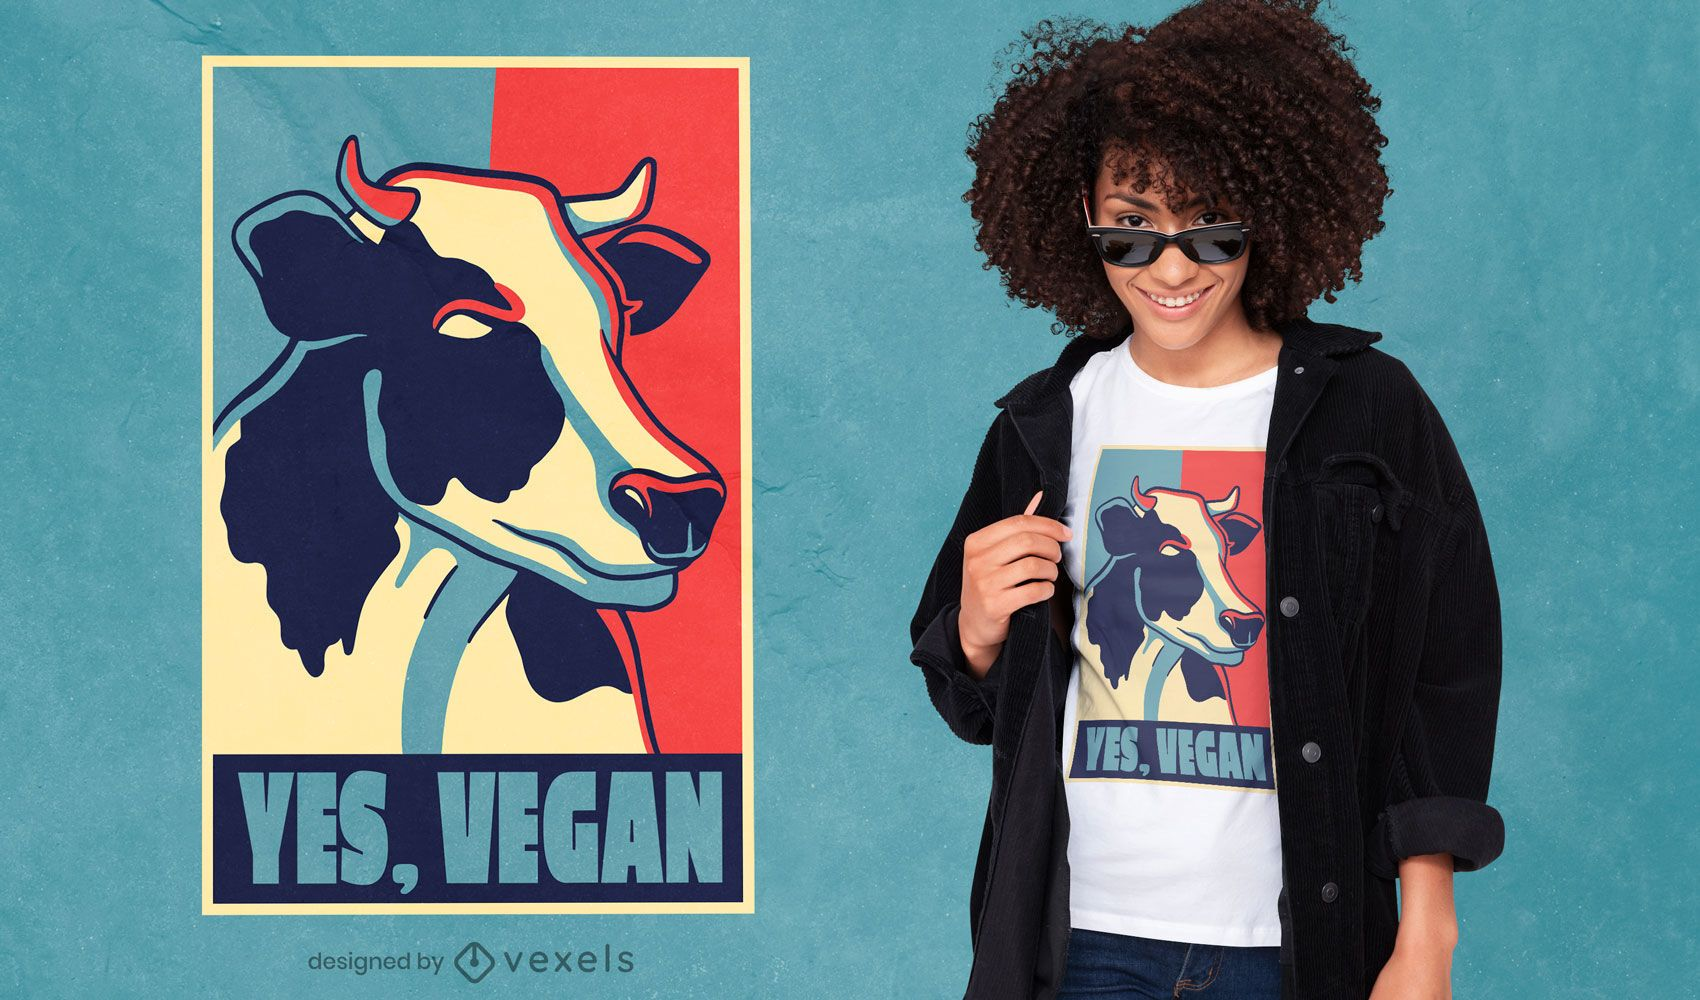 Cow poster vegan quote t-shirt design